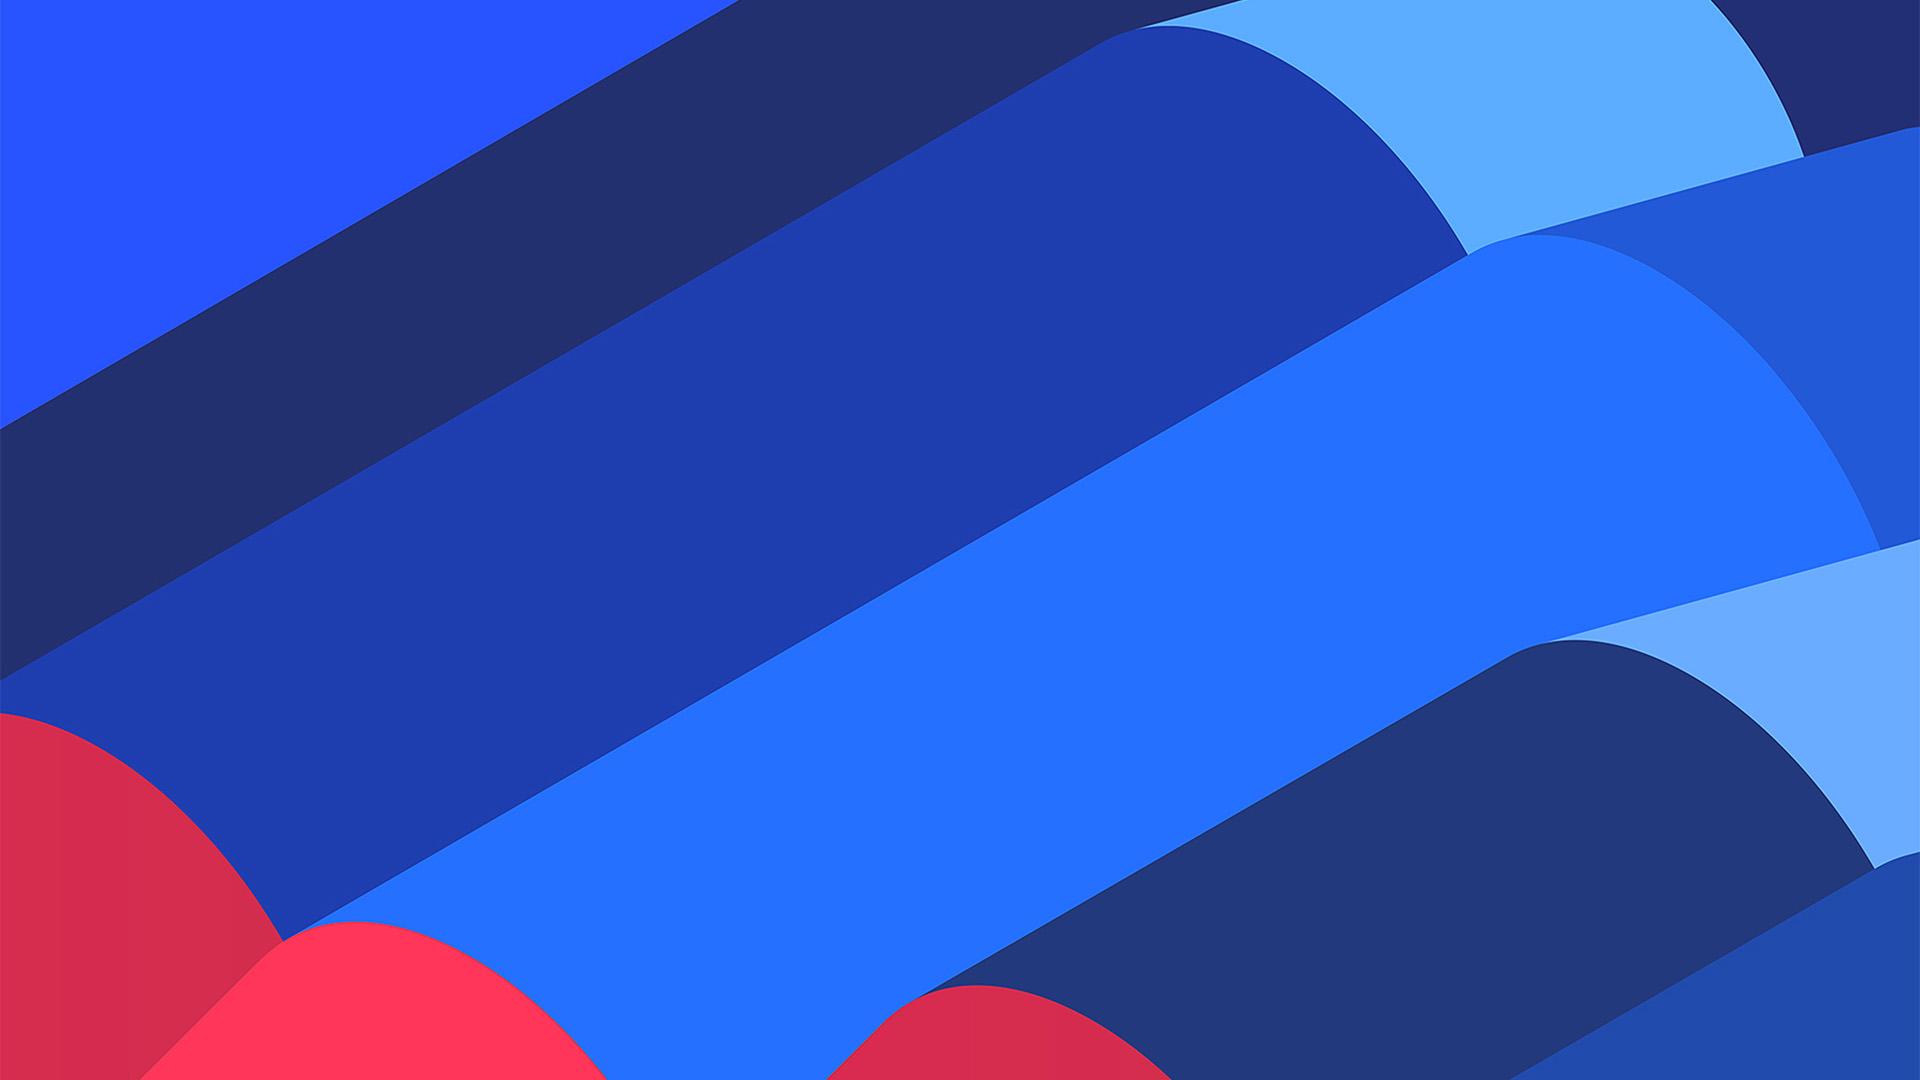 Wallpaper For Desktop Laptop Wb84 Simple Blue Pattern Background